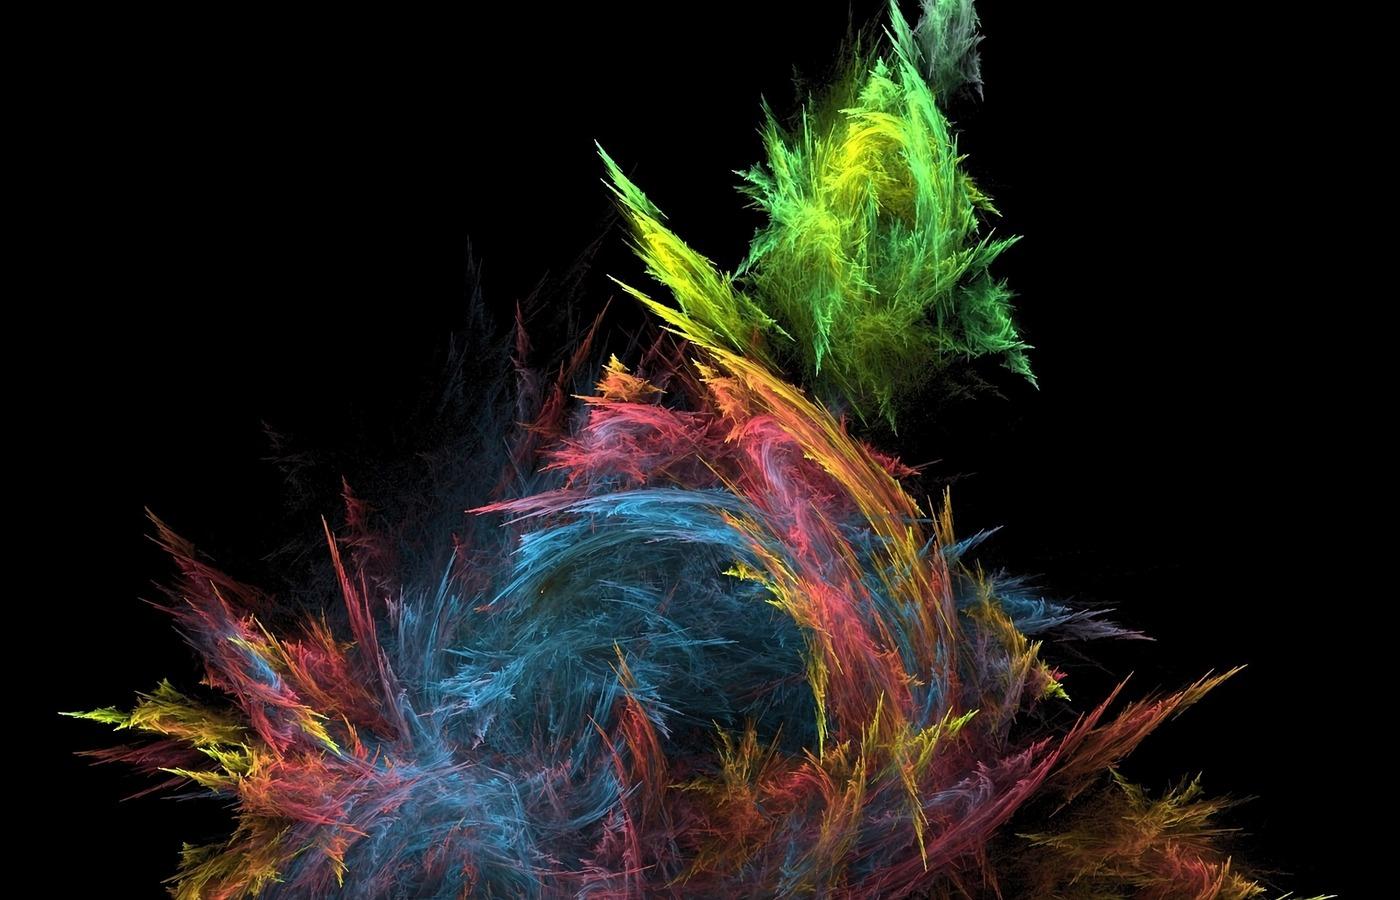 abstract-shape-digital-art-5u.jpg